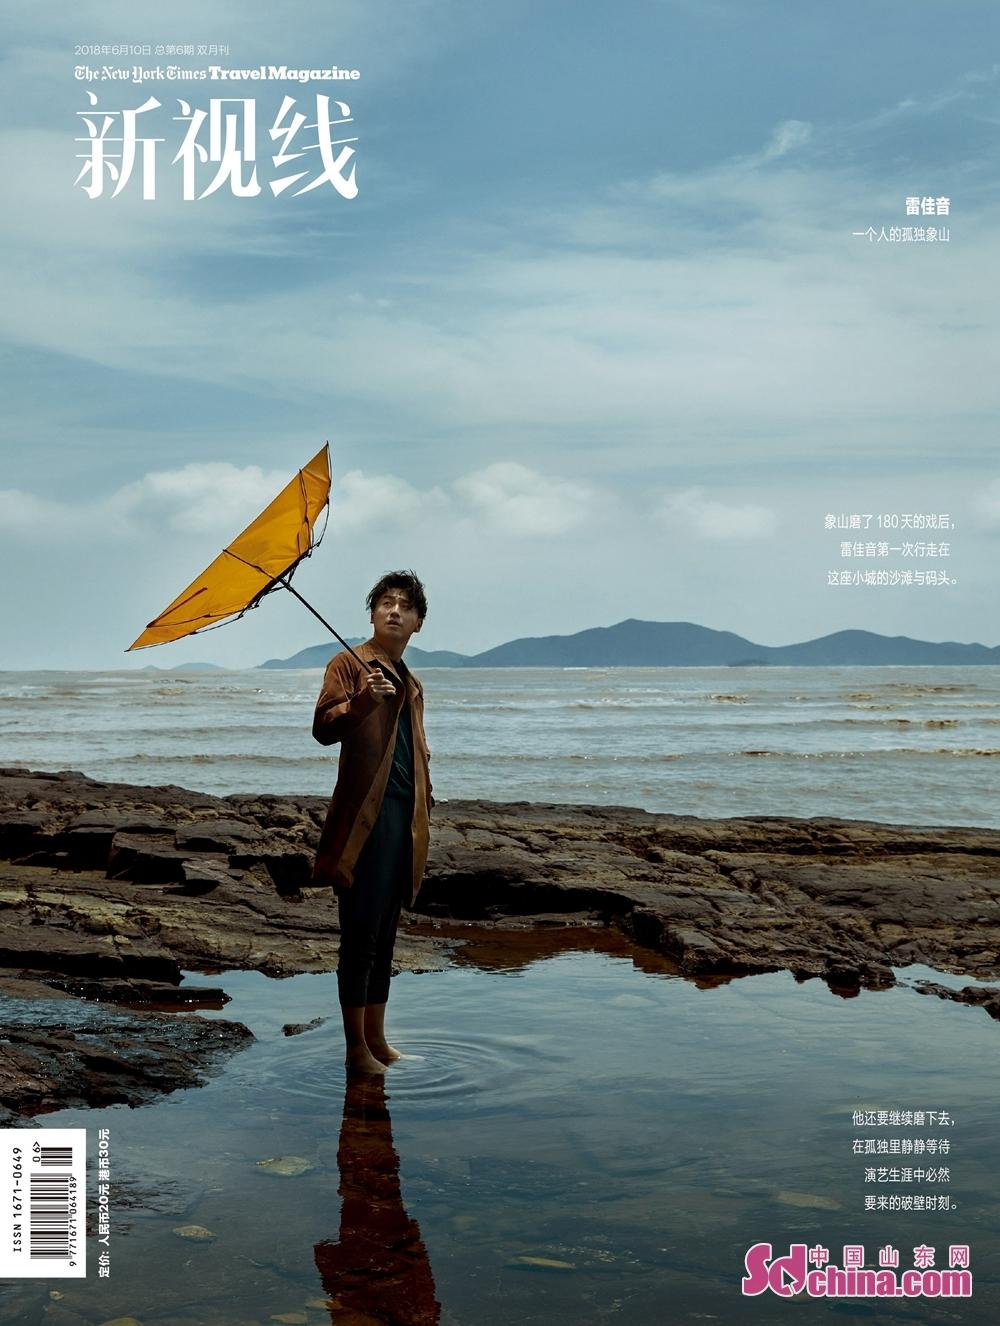 <br/>  6月6日,雷佳音杂志封面曝光。照片中雷佳音撑着伞赤脚伫立在海水中,尽显潇洒本性。<br/>  日前,雷佳音主演的电视剧《长安十二时 辰》仍在紧张的拍摄中。该剧讲述了唐时期雷佳音主演的张小敬在24个小时之内阻止一场&amp;ldquo;恐怖行动&amp;rdquo;的故事,超过半年的拍摄时长也曾让雷佳音坦言:&amp;ldquo;(拍这个戏)真的拼了命。&amp;rdquo;近日,由雷佳音、佟丽娅主演的电影《超时空同居》成功逆袭为当季票房黑马。<br/>